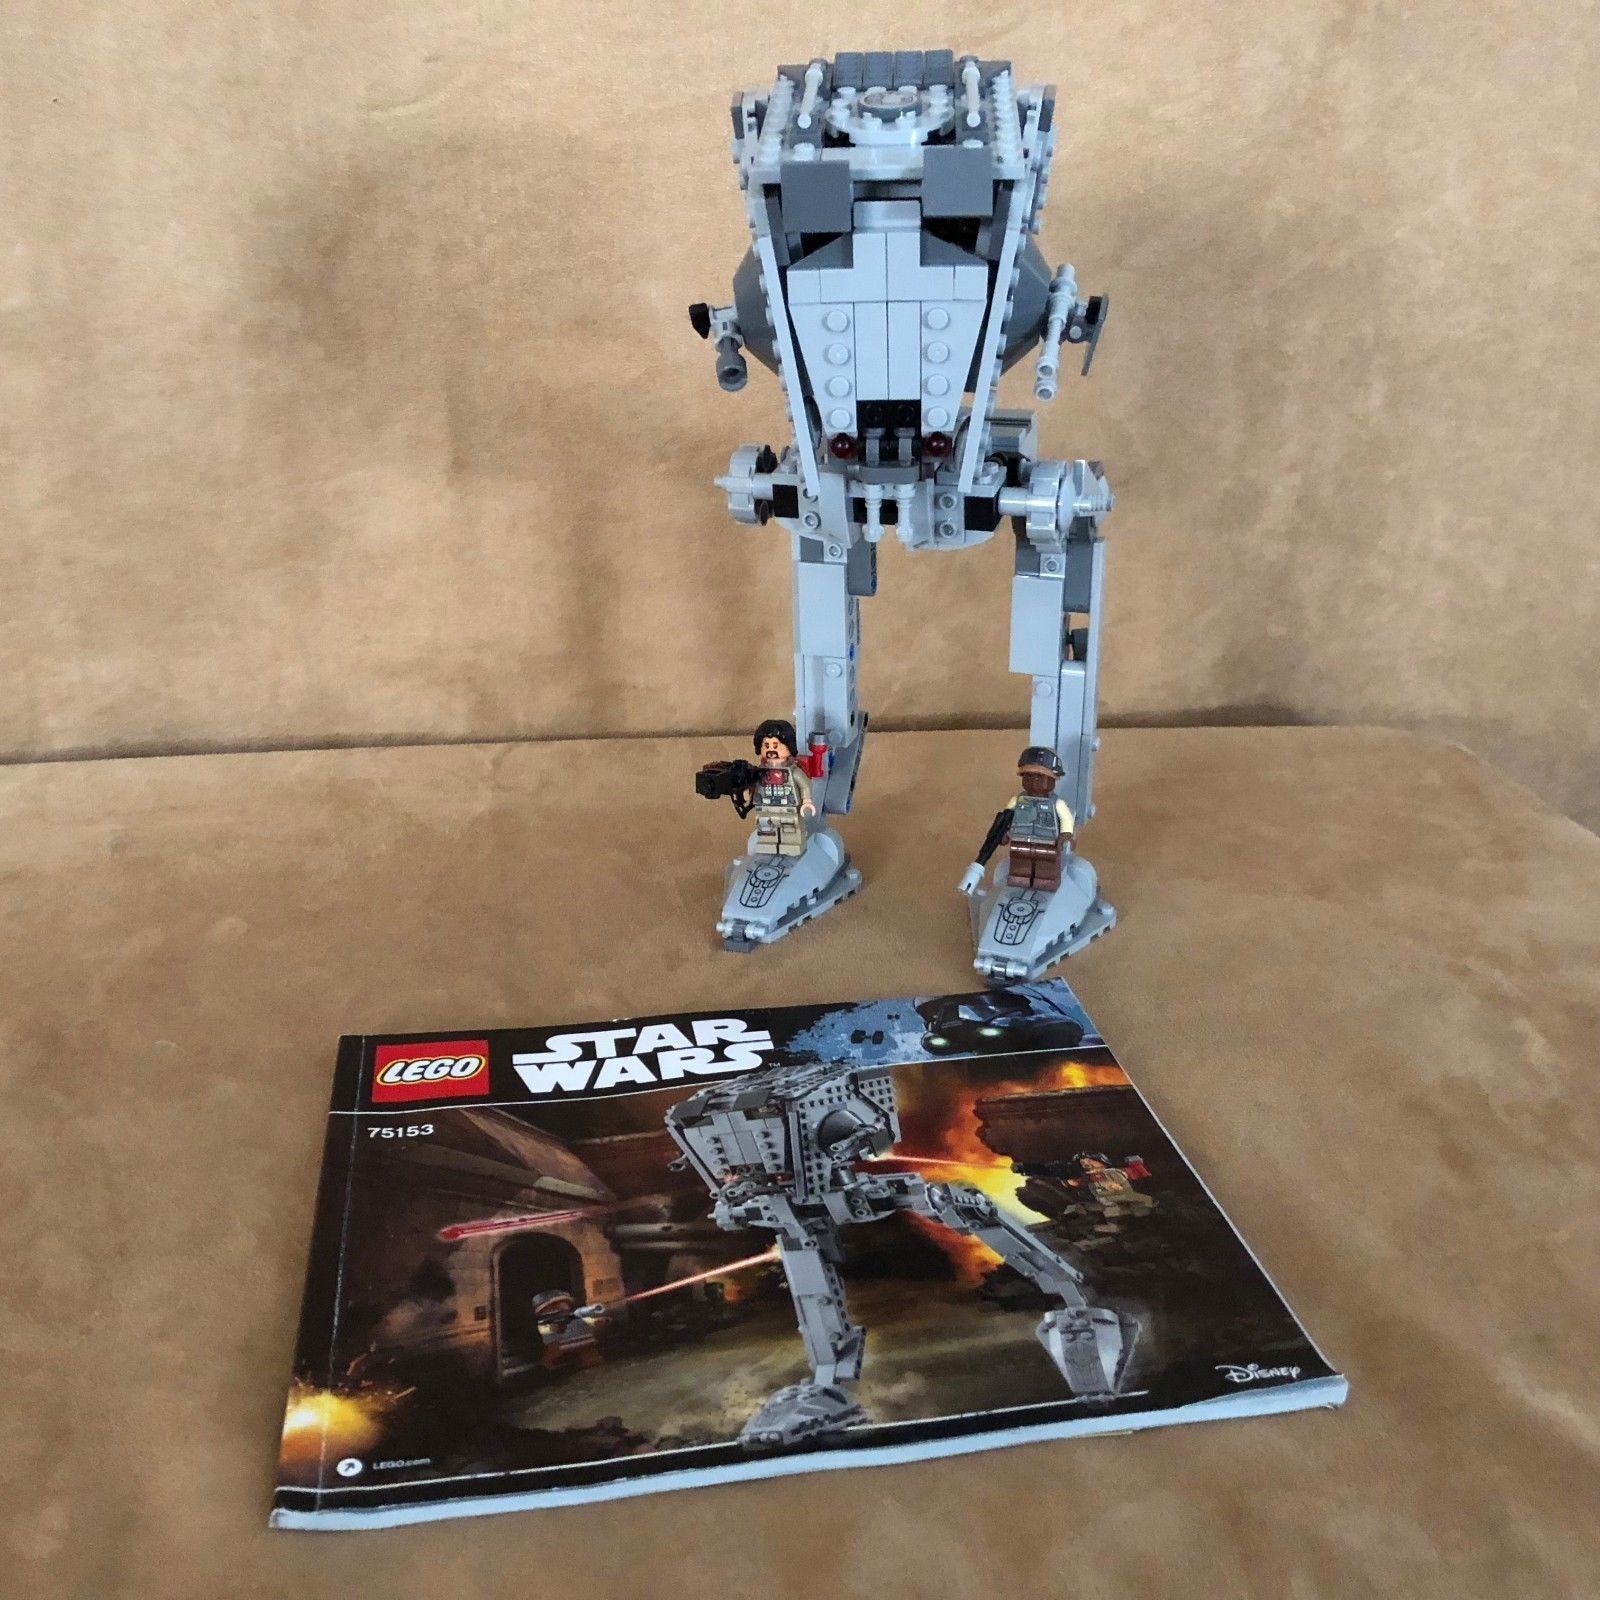 75153 Lego Complete Star Wars At St Walker Ship Instructions